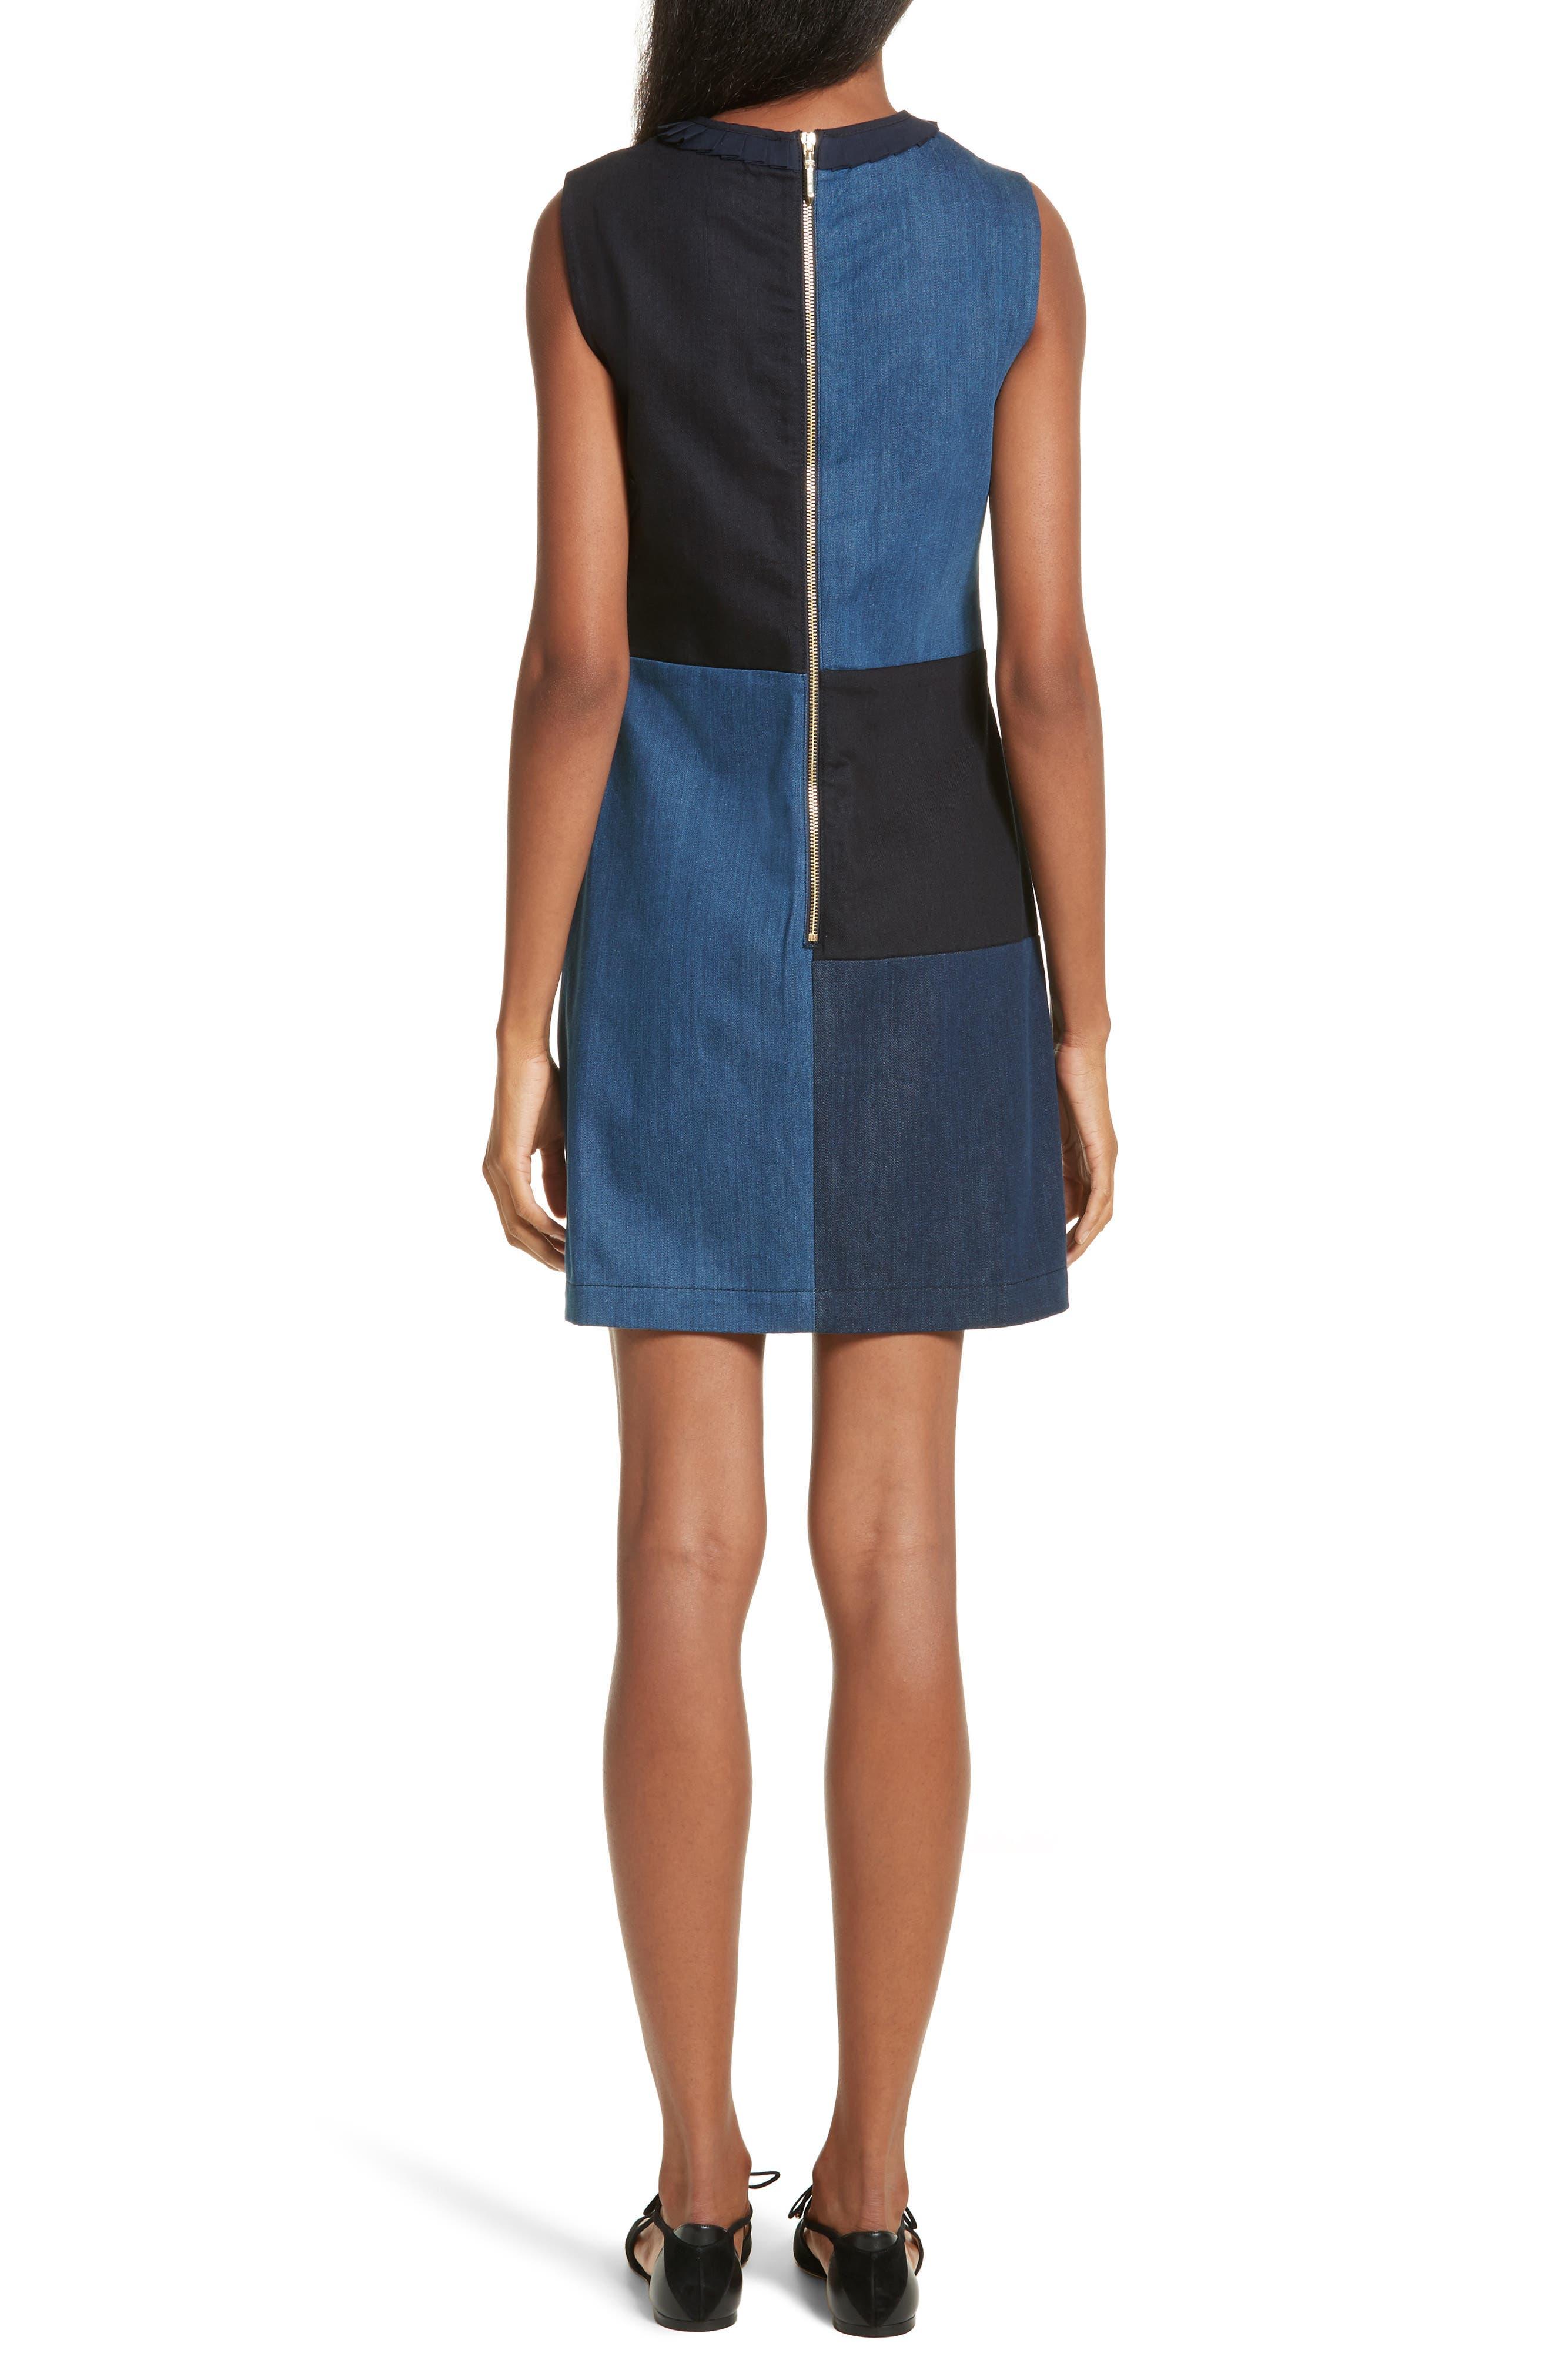 Ted Baker Morfee London Colorblock Denim A-Line Dress,                             Alternate thumbnail 2, color,                             431